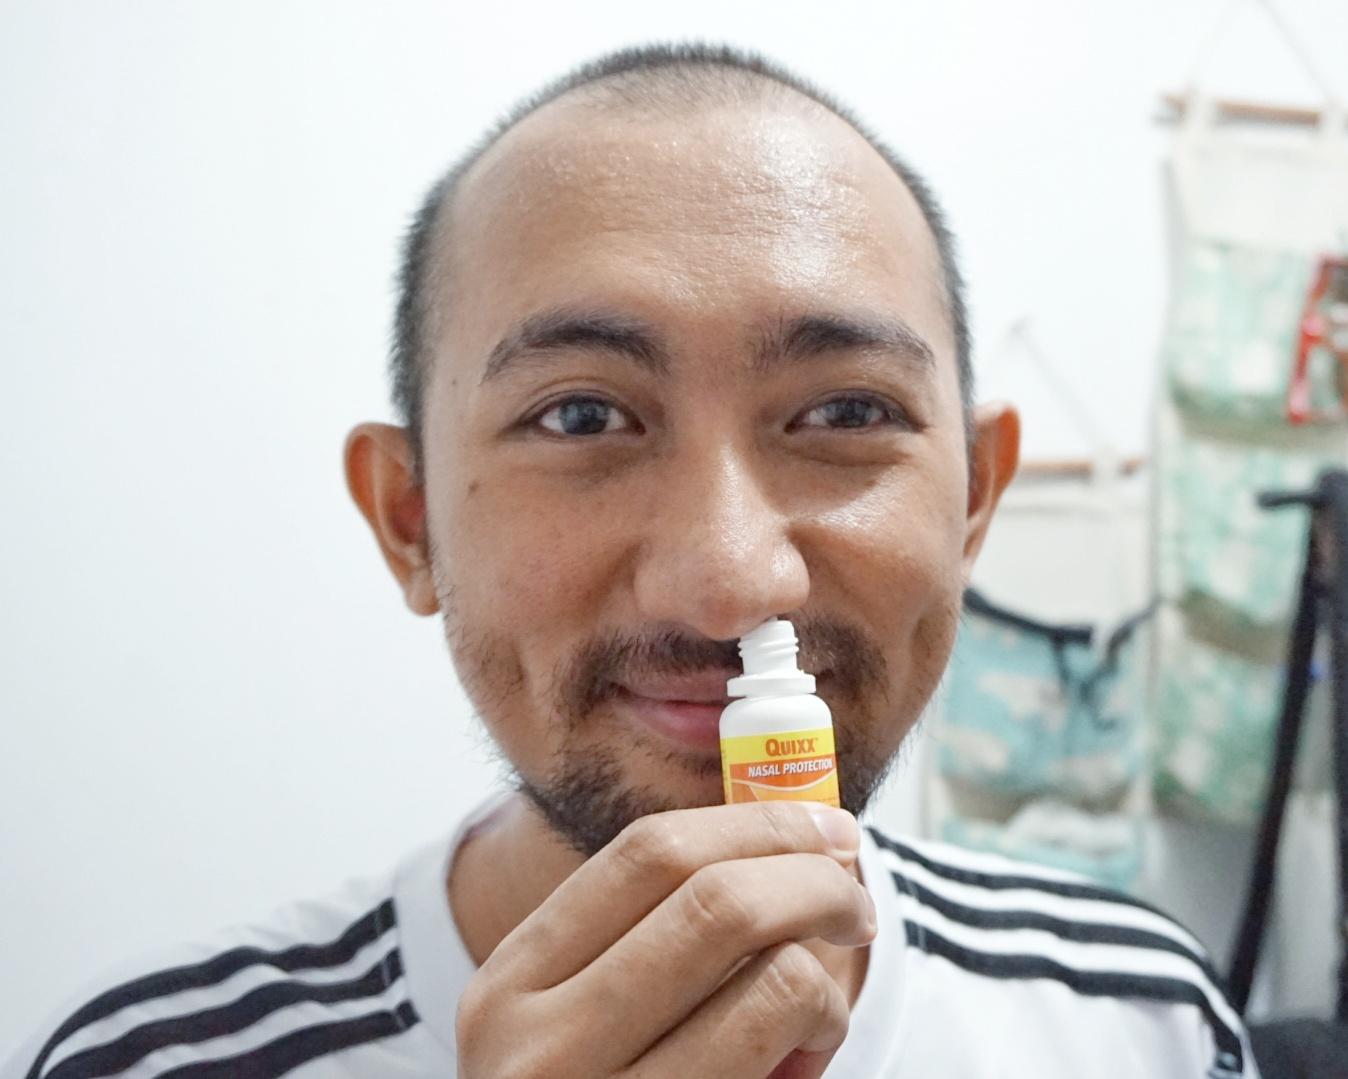 QUIXX Nasal Protection Uwan Urwan